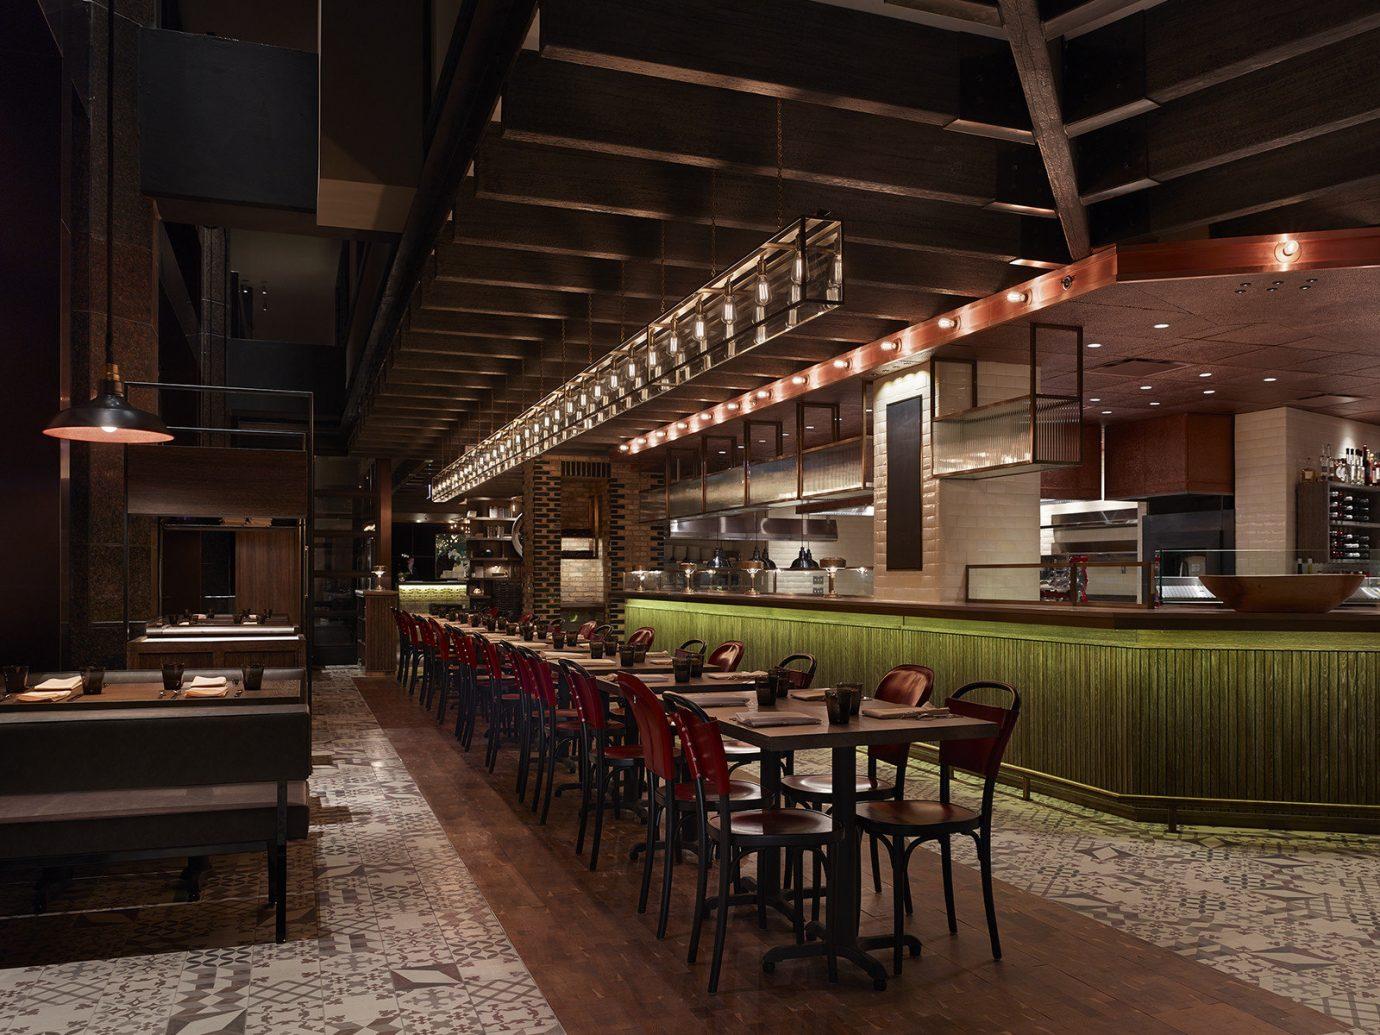 Food + Drink indoor ceiling building restaurant interior design Bar area furniture several dining room